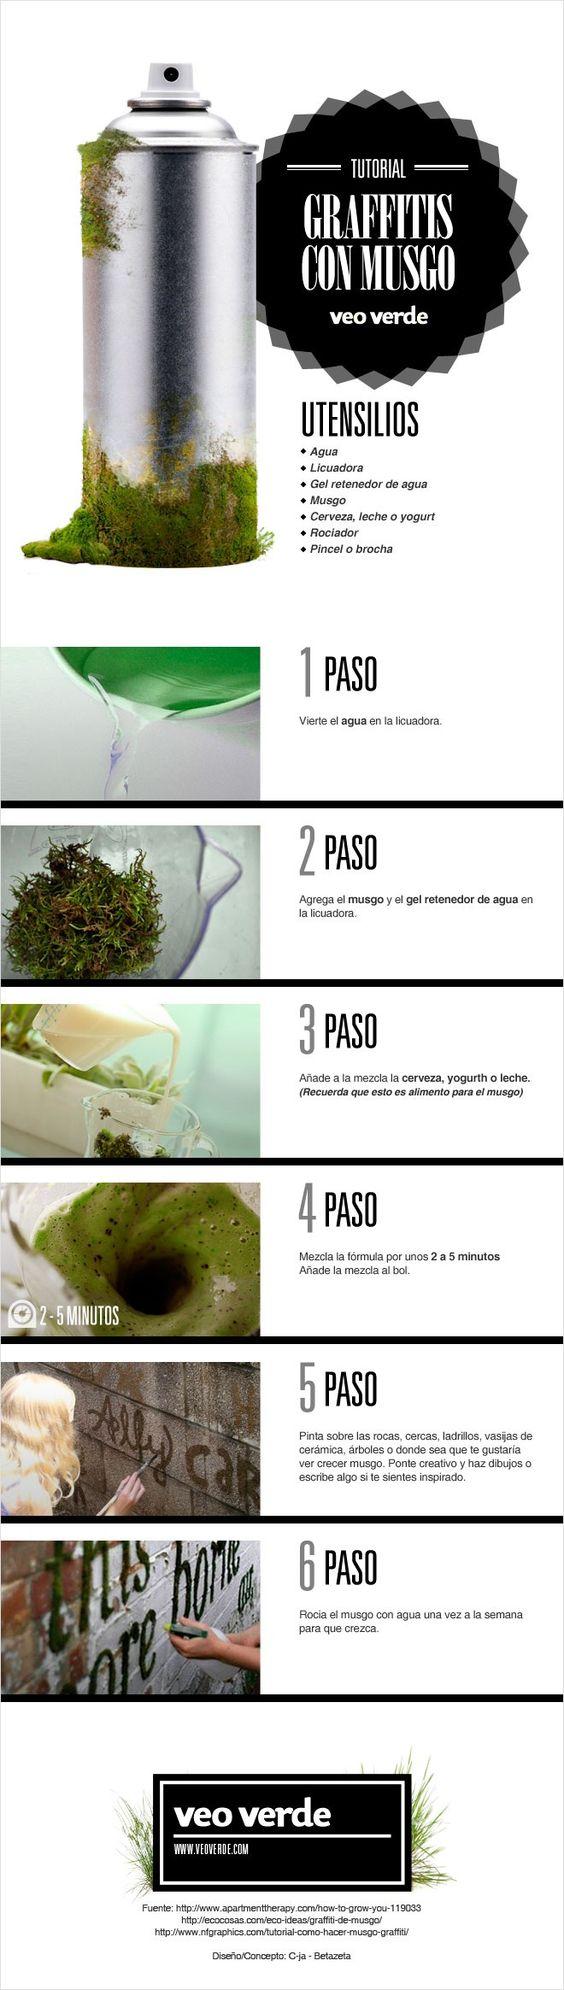 Infografía Veo Verde: ¡¡Aprende a hacer graffiti de musgo!!